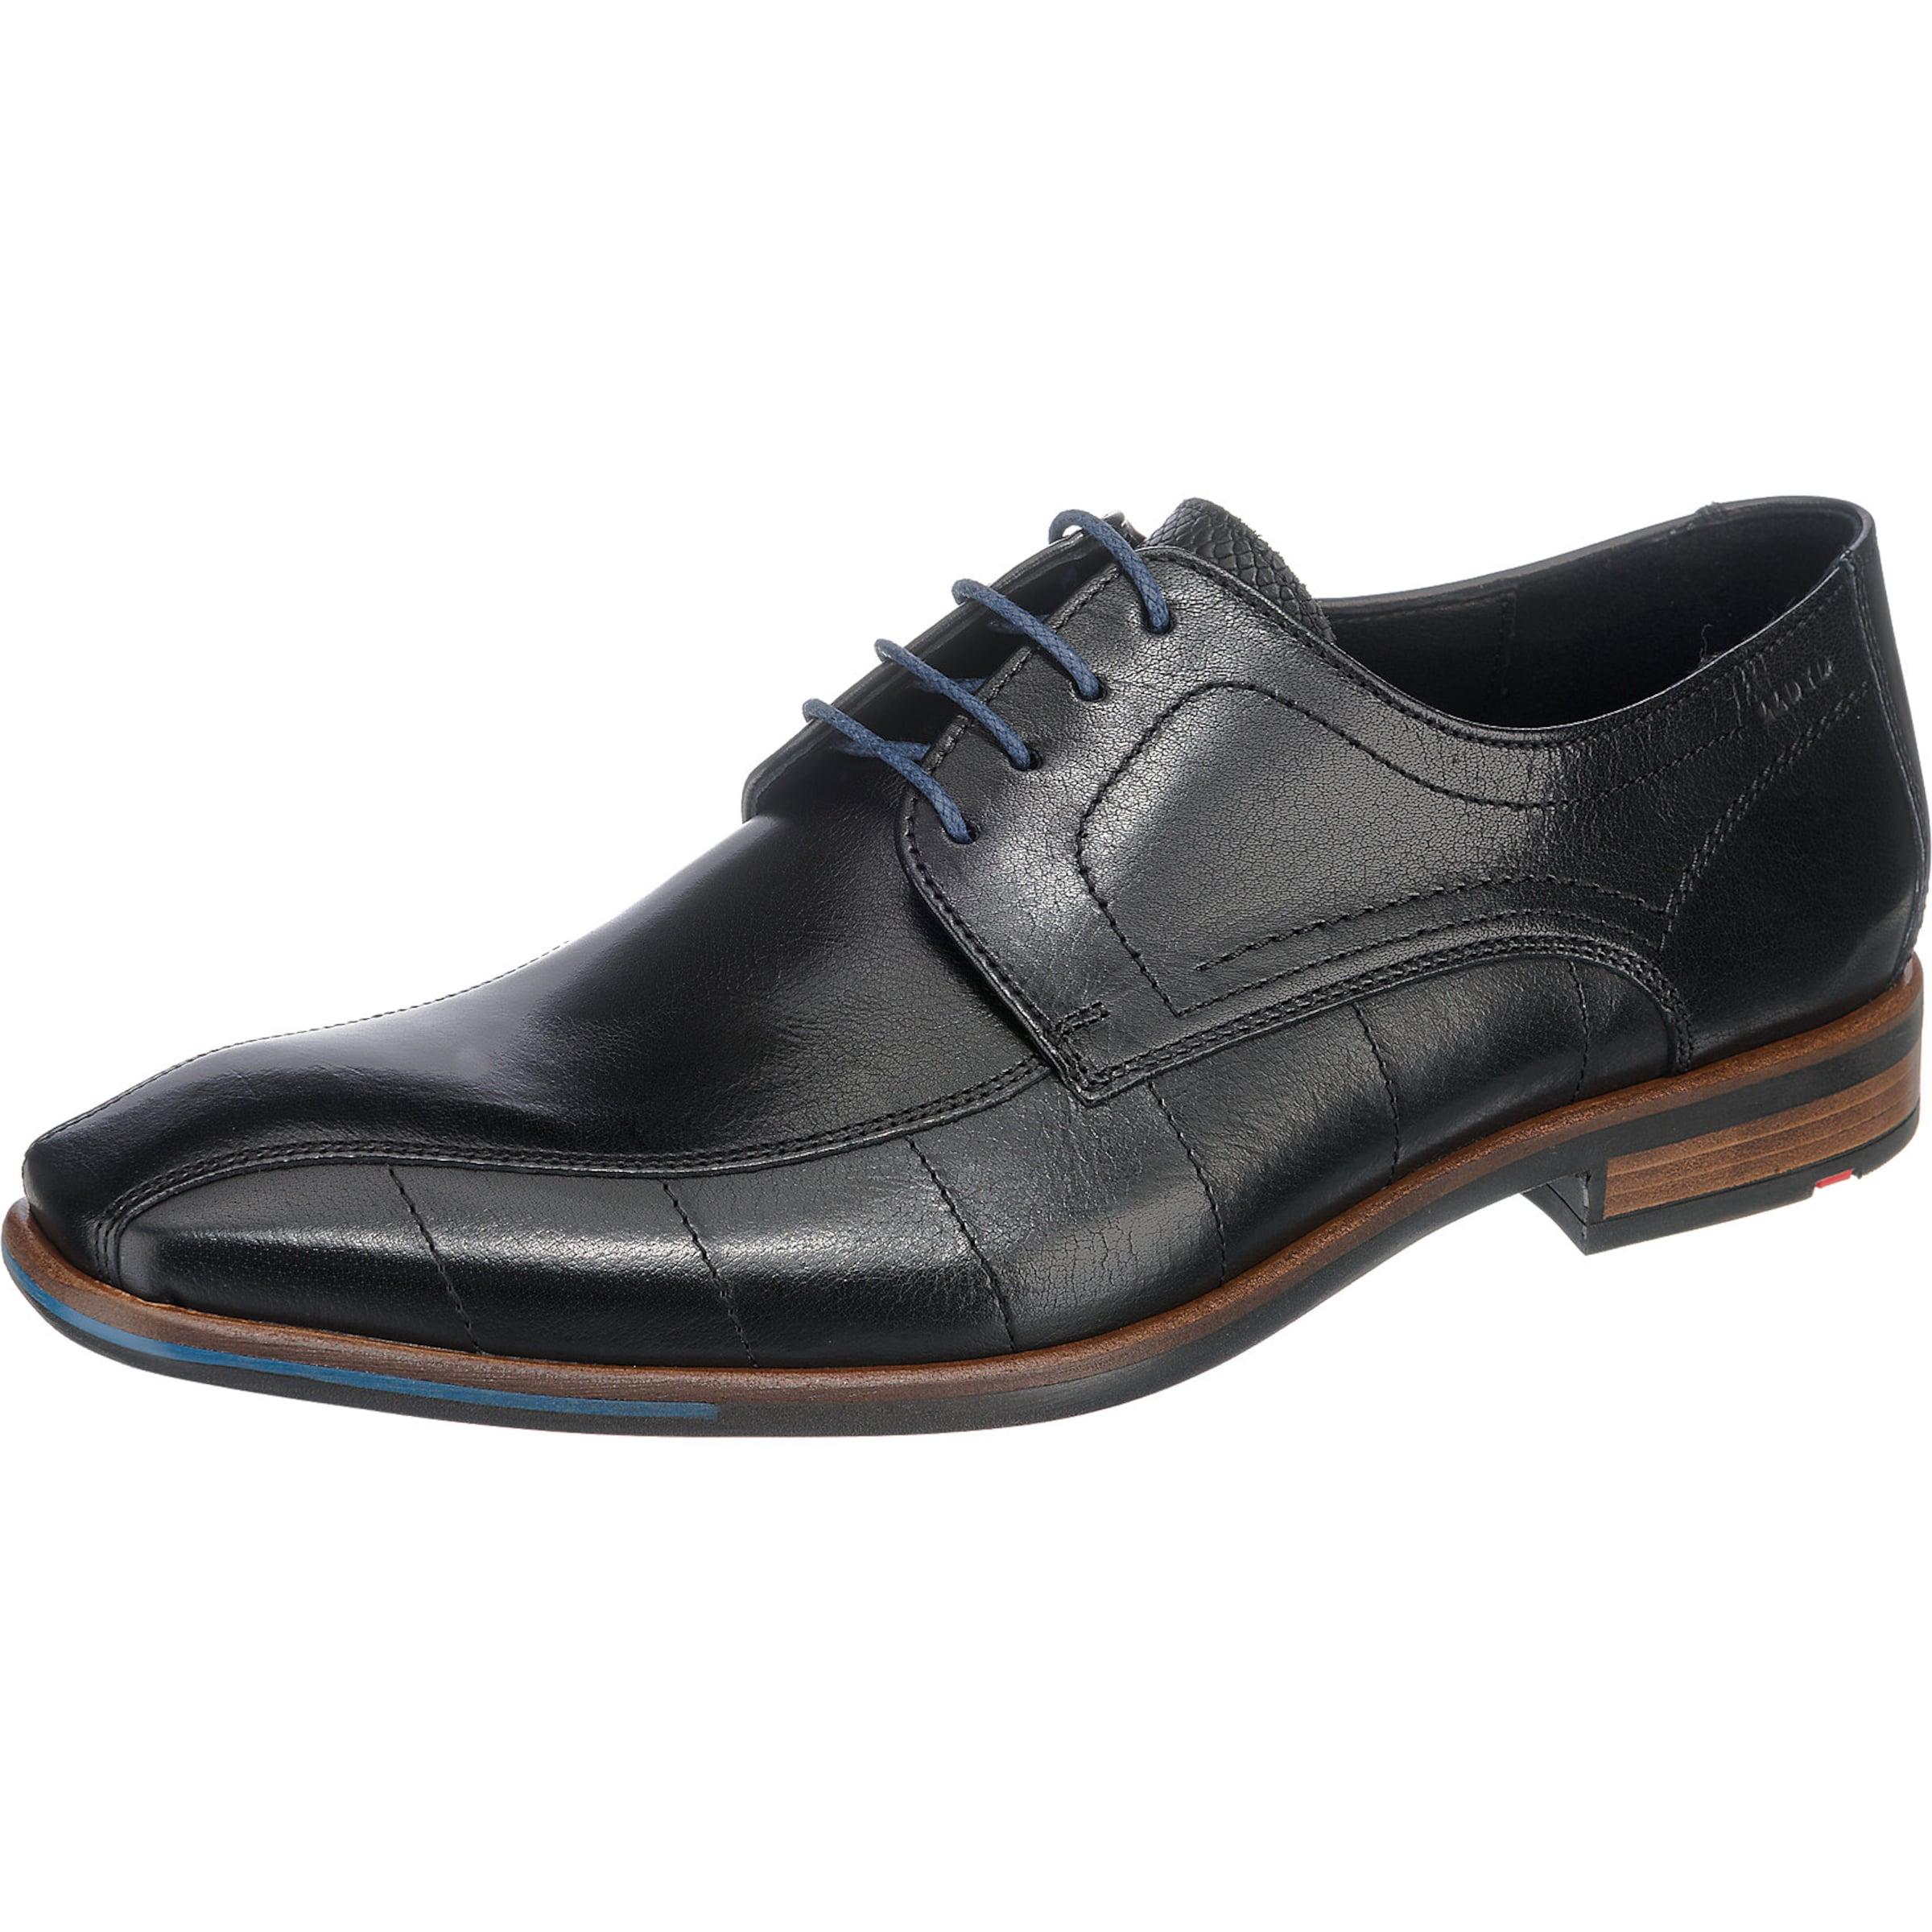 LLOYD Donny Business Schuhe Verschleißfeste billige Schuhe